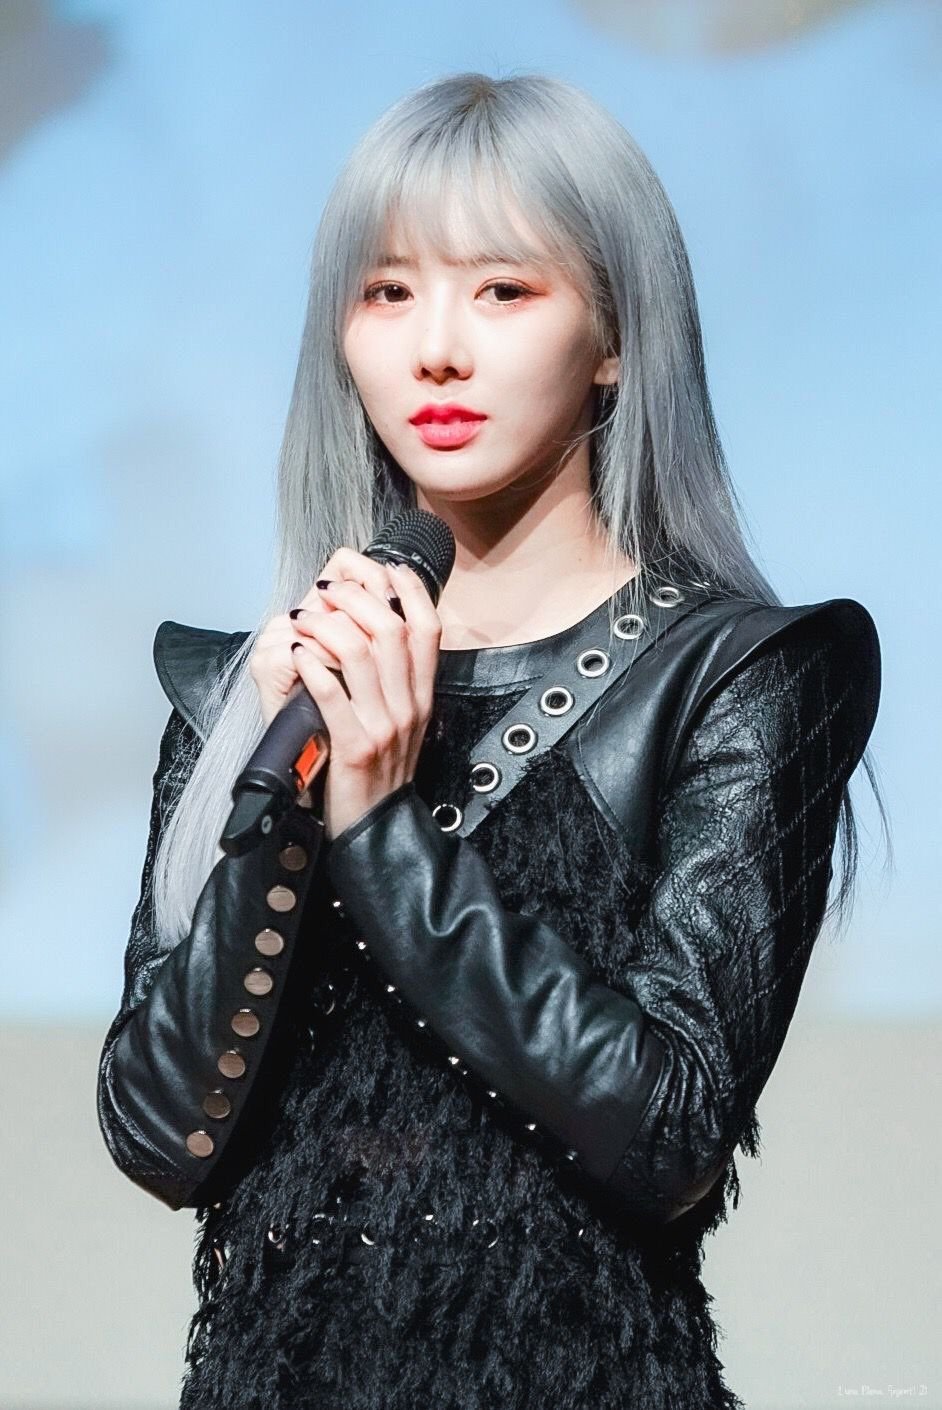 Dreamcatcher Yoohyeon Dream Catcher Kpop Girls Girl